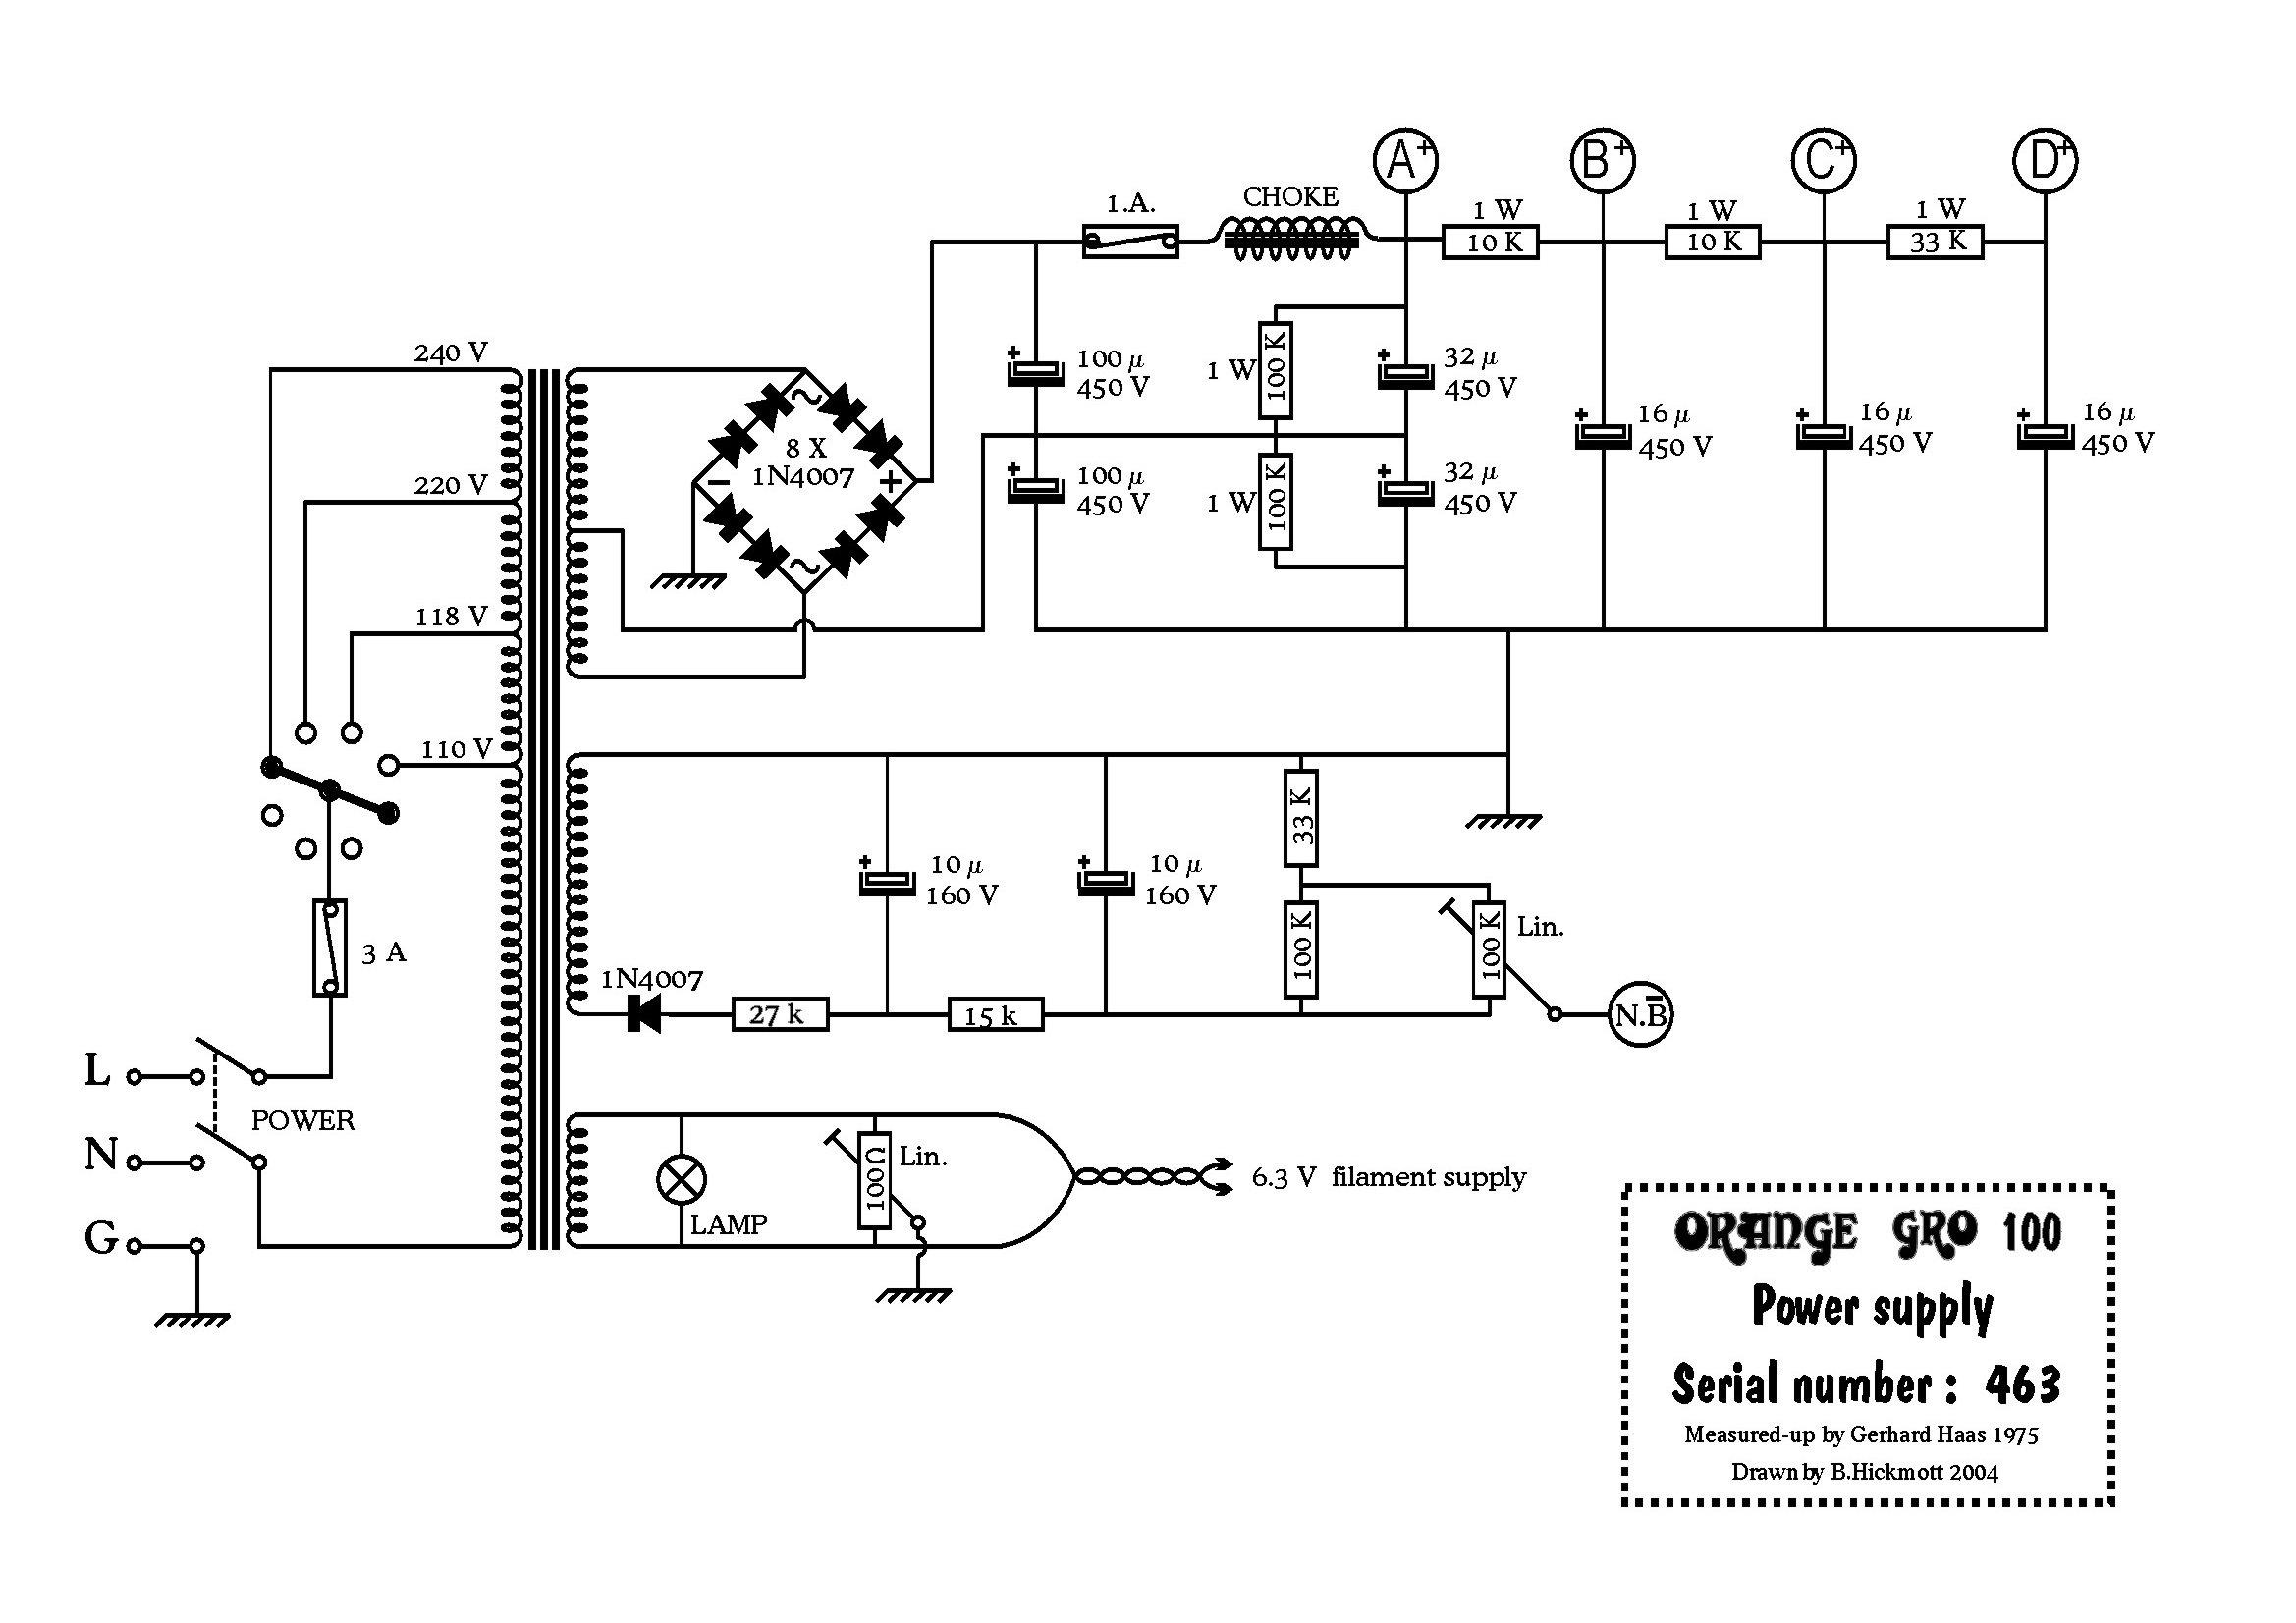 Gro100 Power Supply